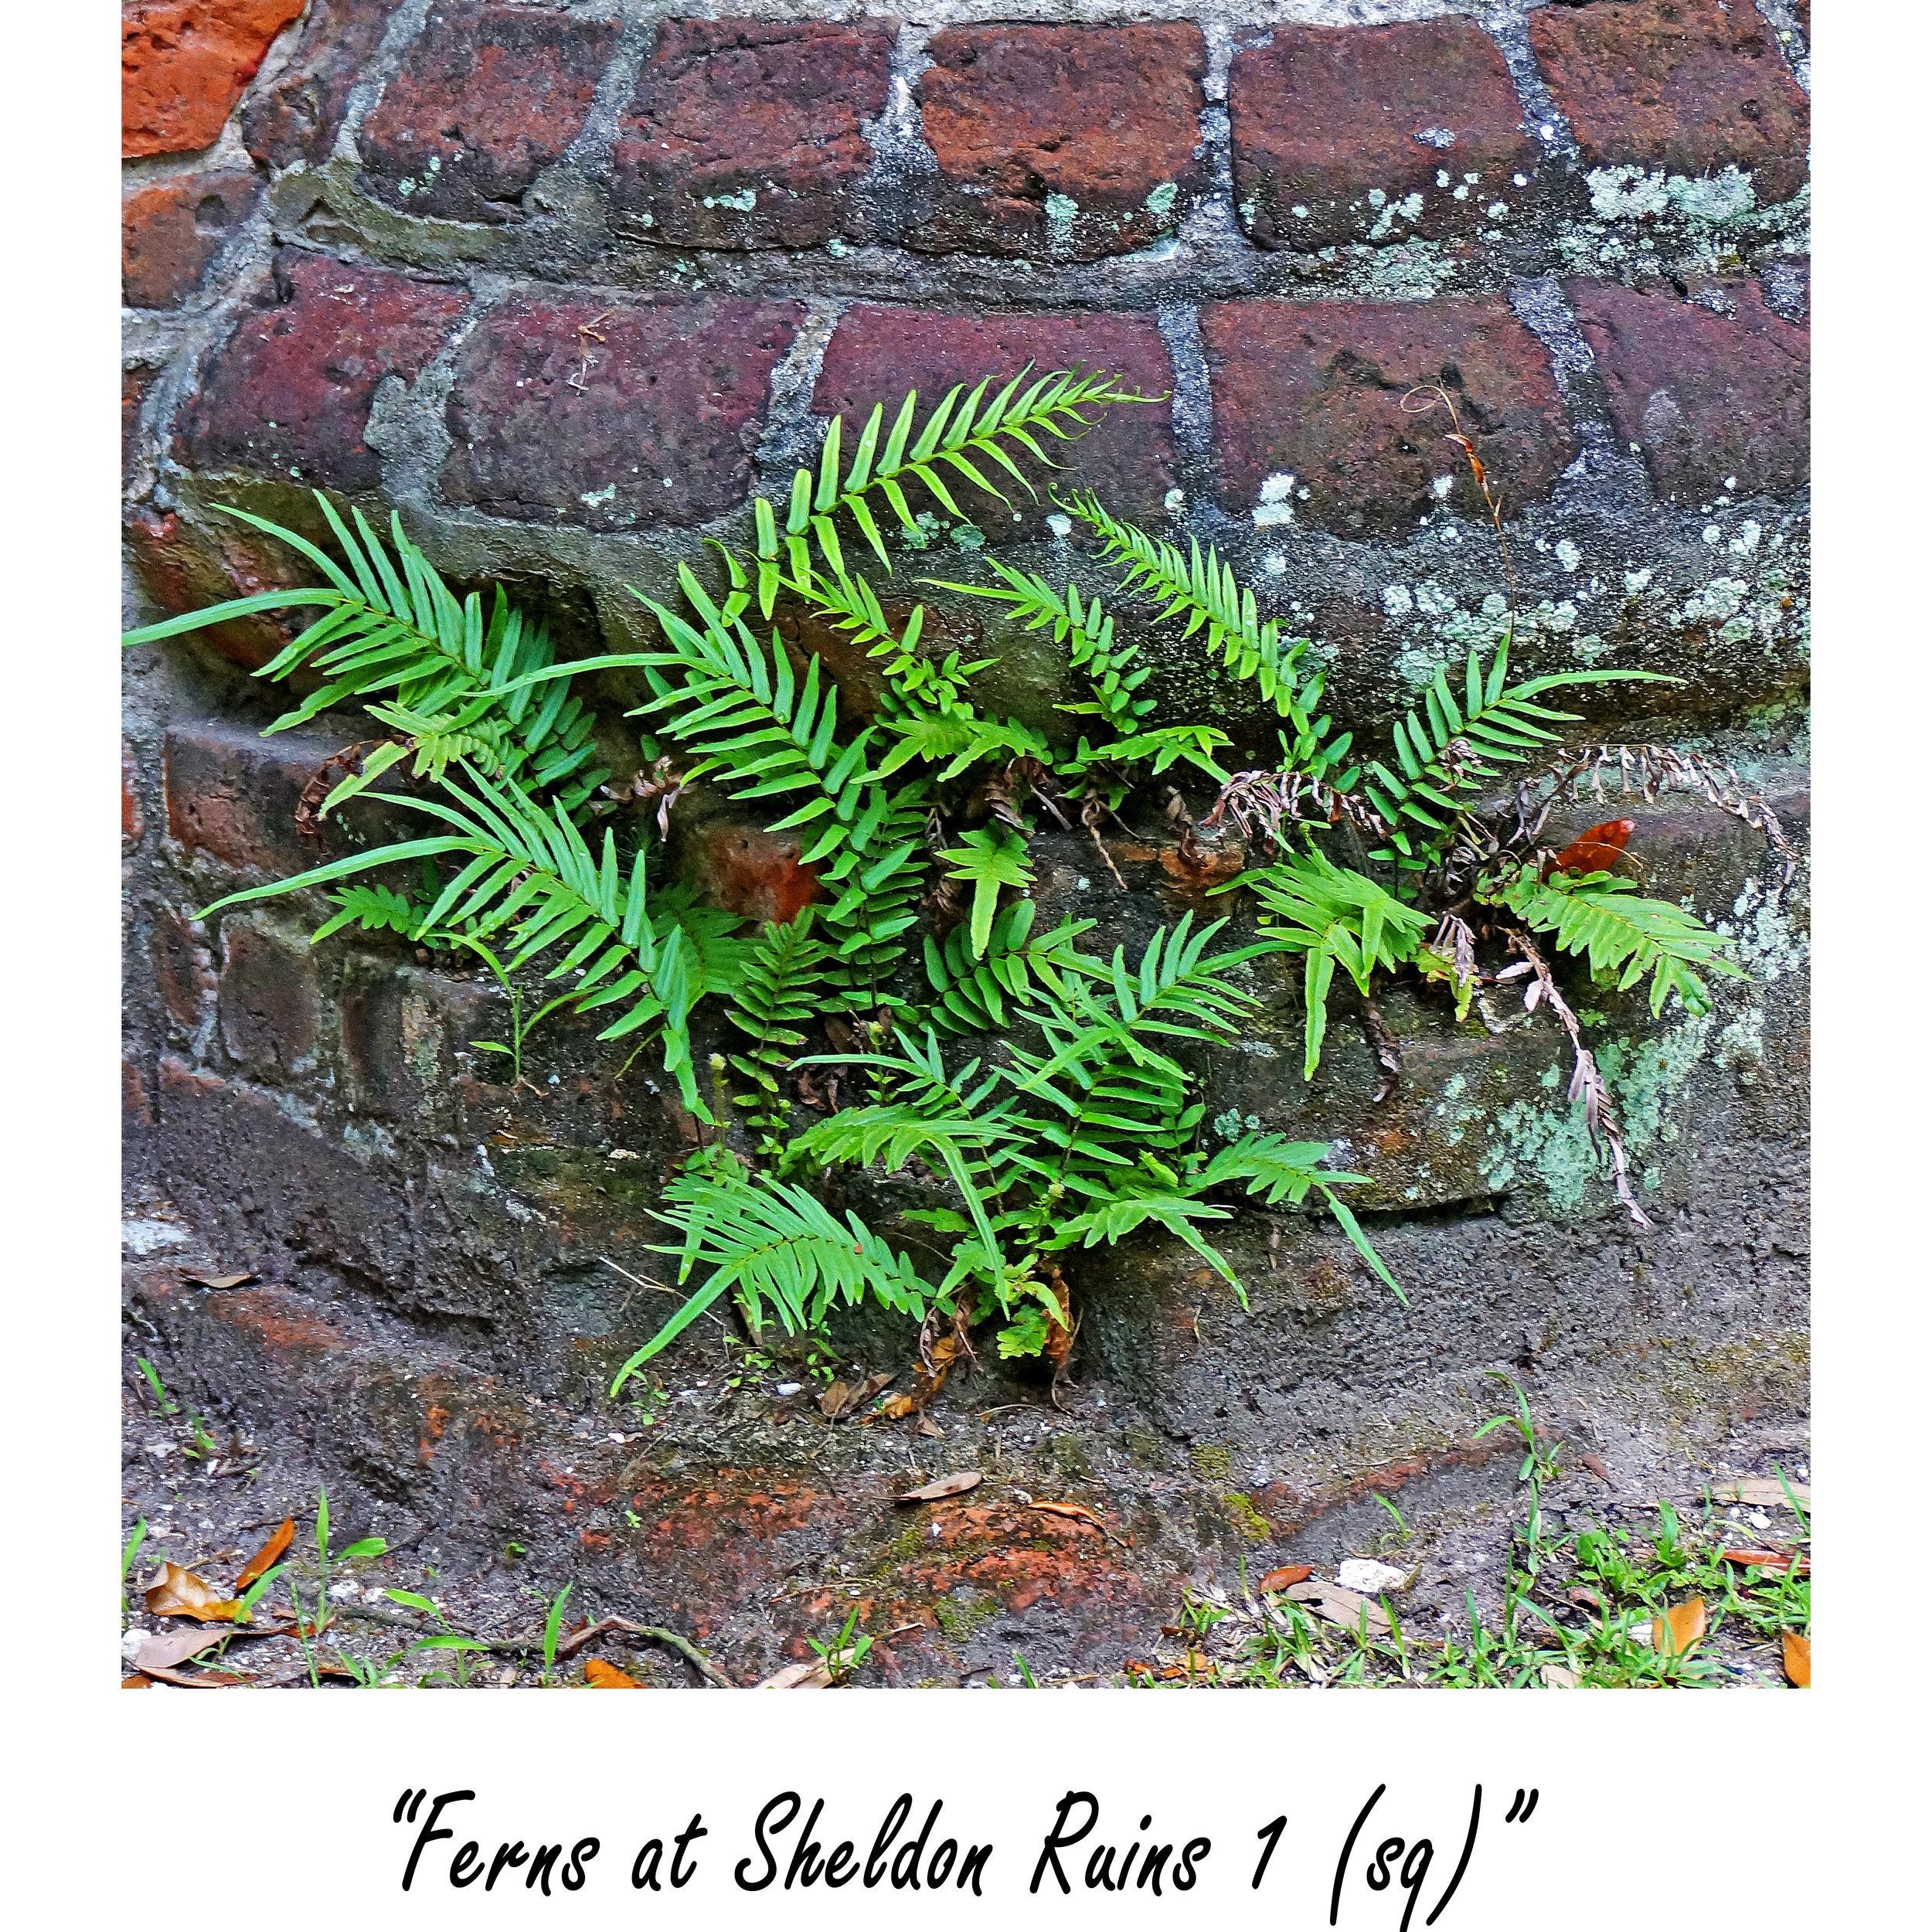 Ferns at Sheldon Ruins 1 (sq).jpg